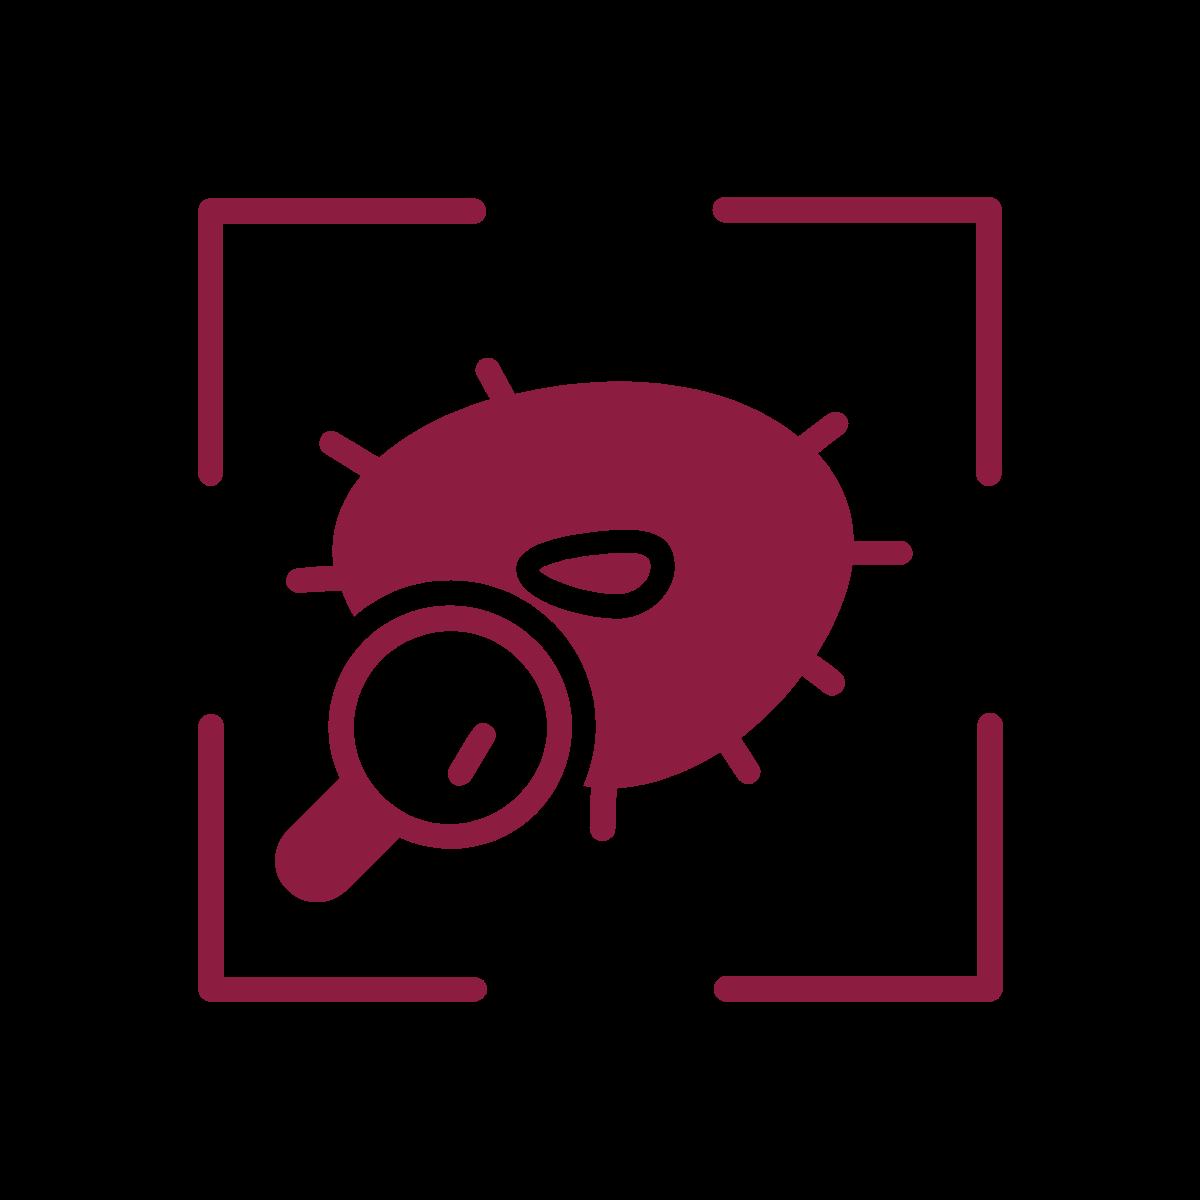 Contaminant detection icon